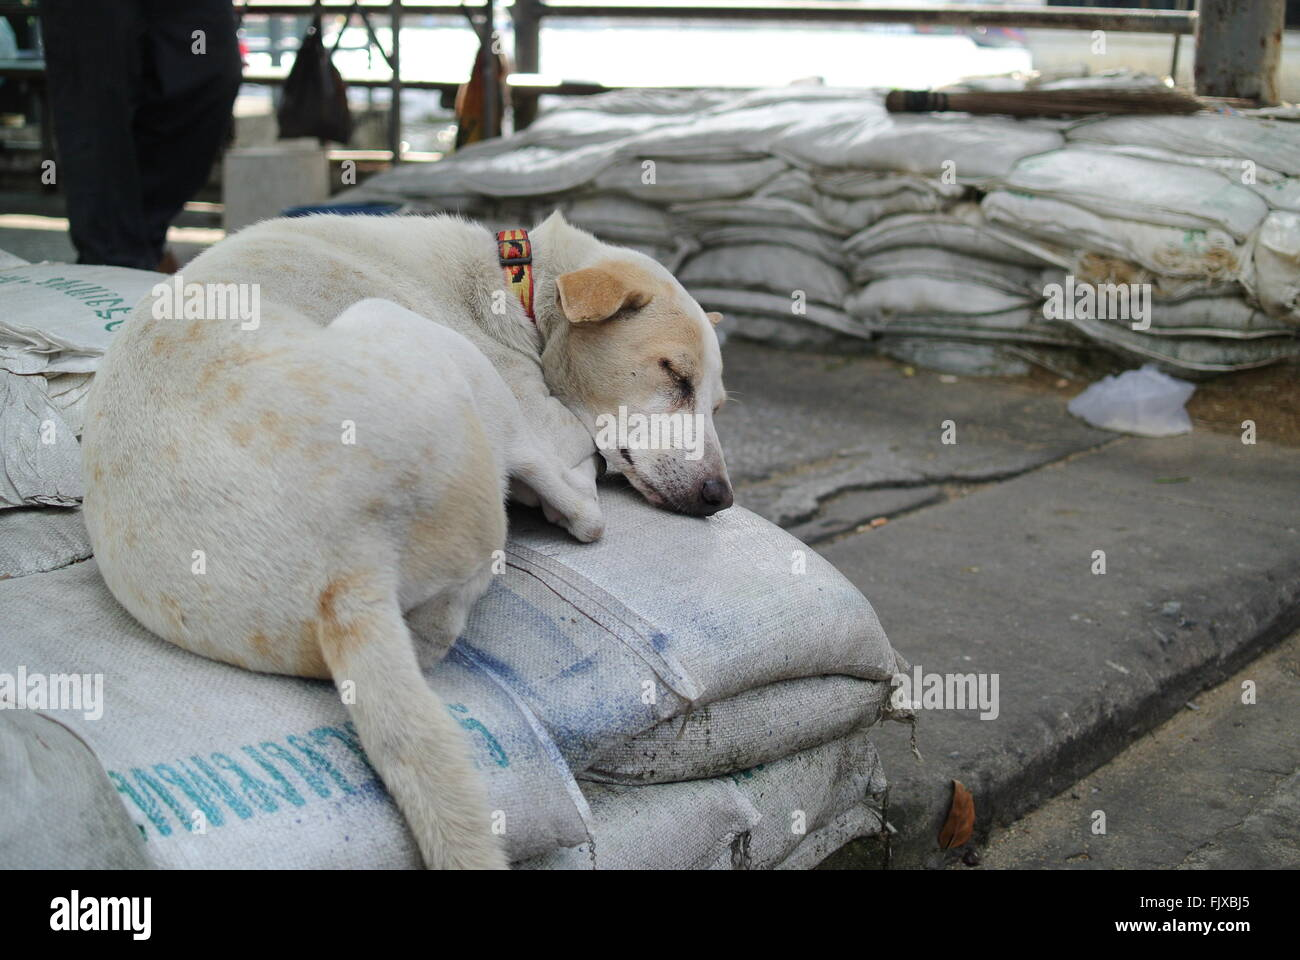 Dog Sleeping On Stacked Sacks - Stock Image